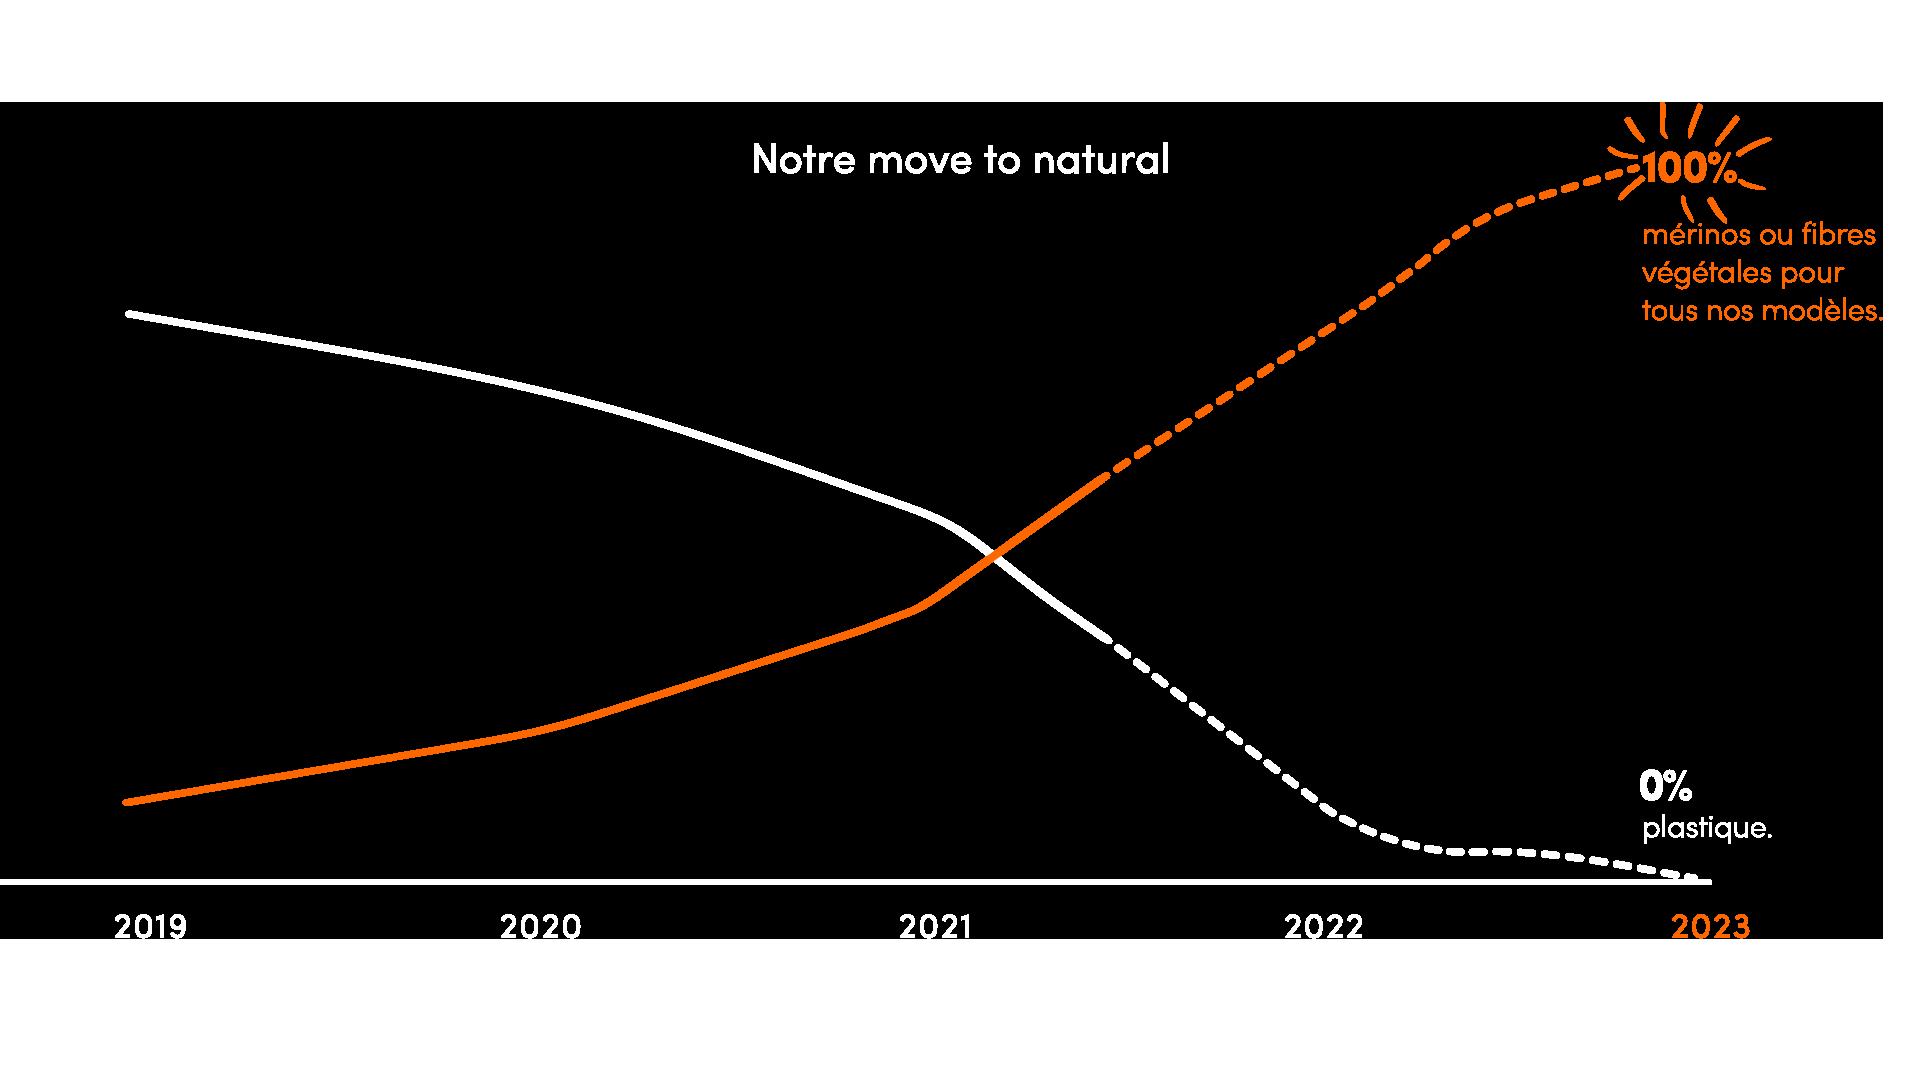 Mote to natural graph